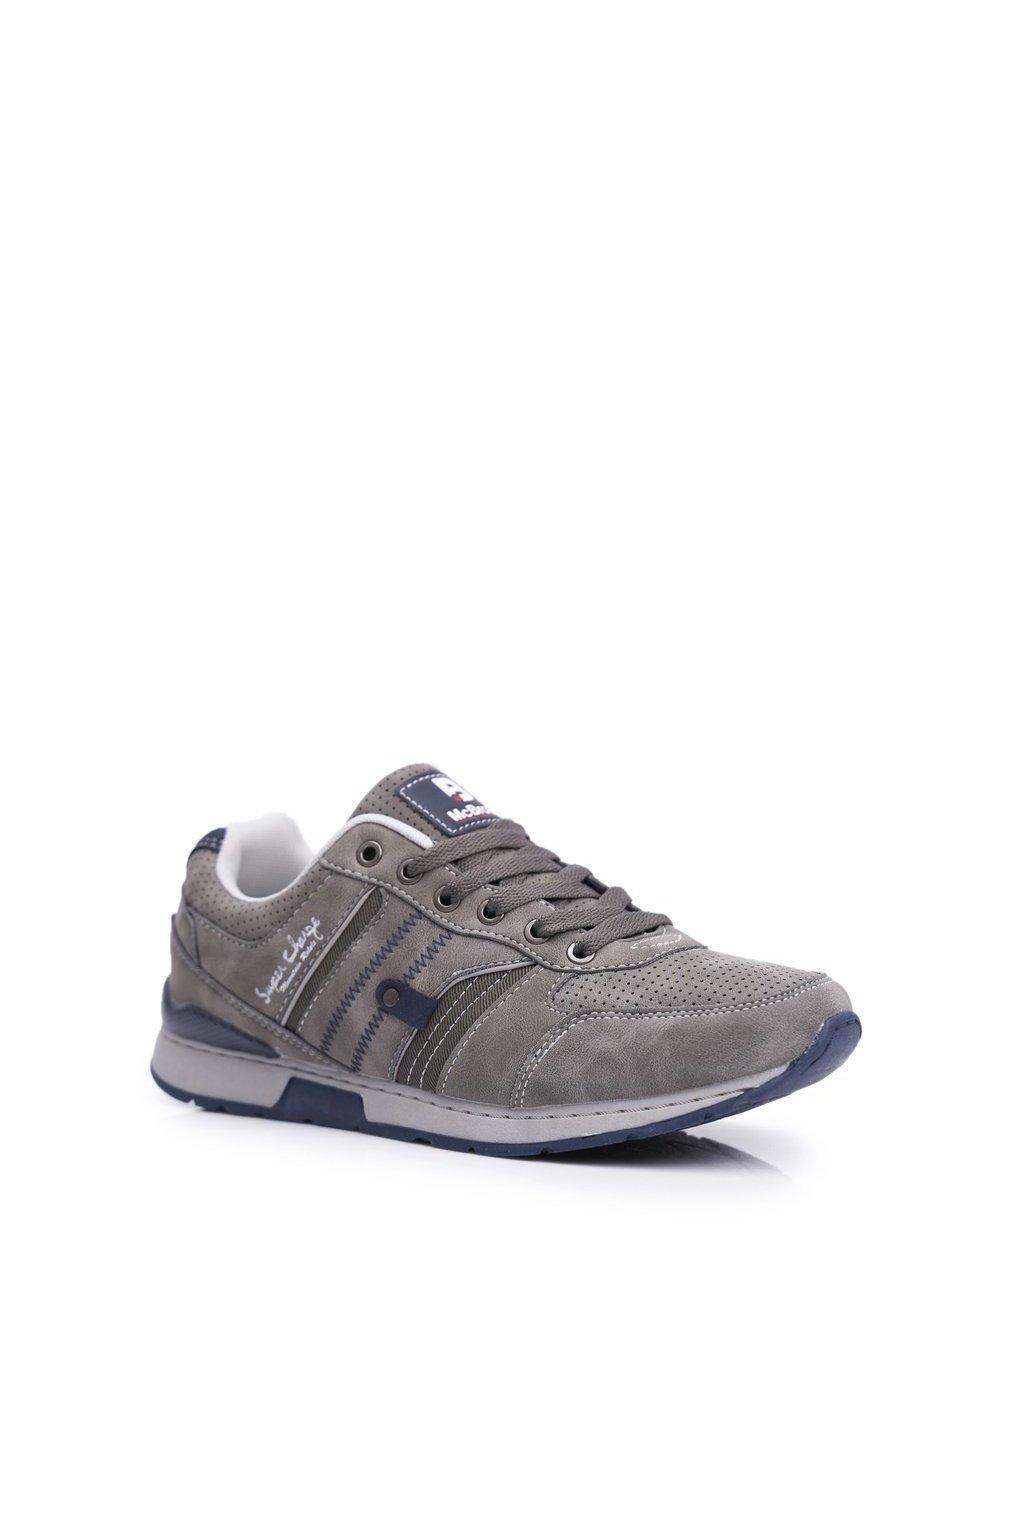 Sivá obuv kód topánok 9MN03-0881 GREY